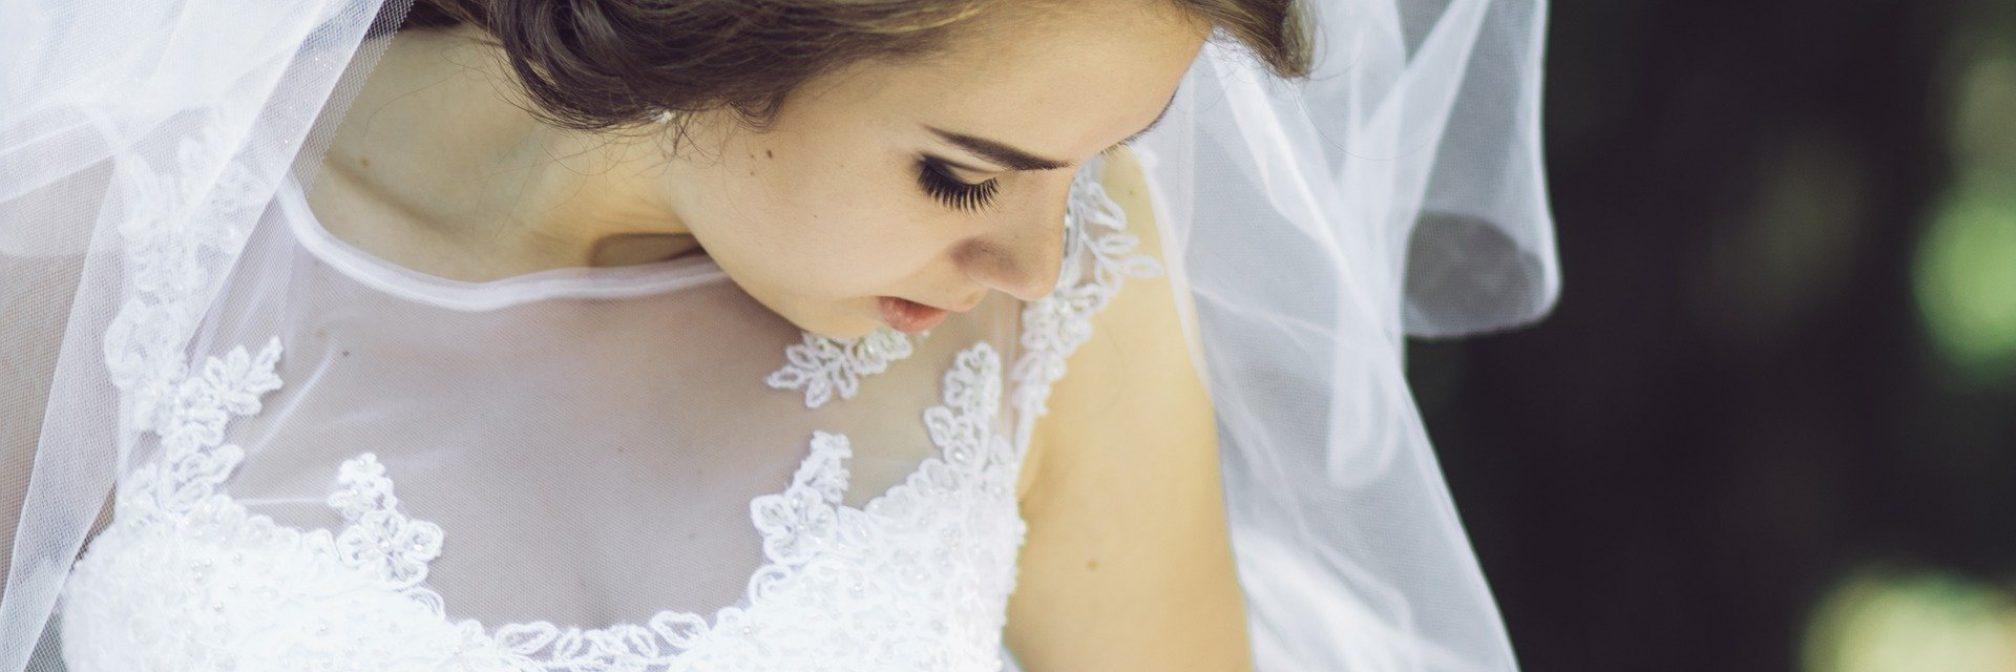 wedding-2367561_1920